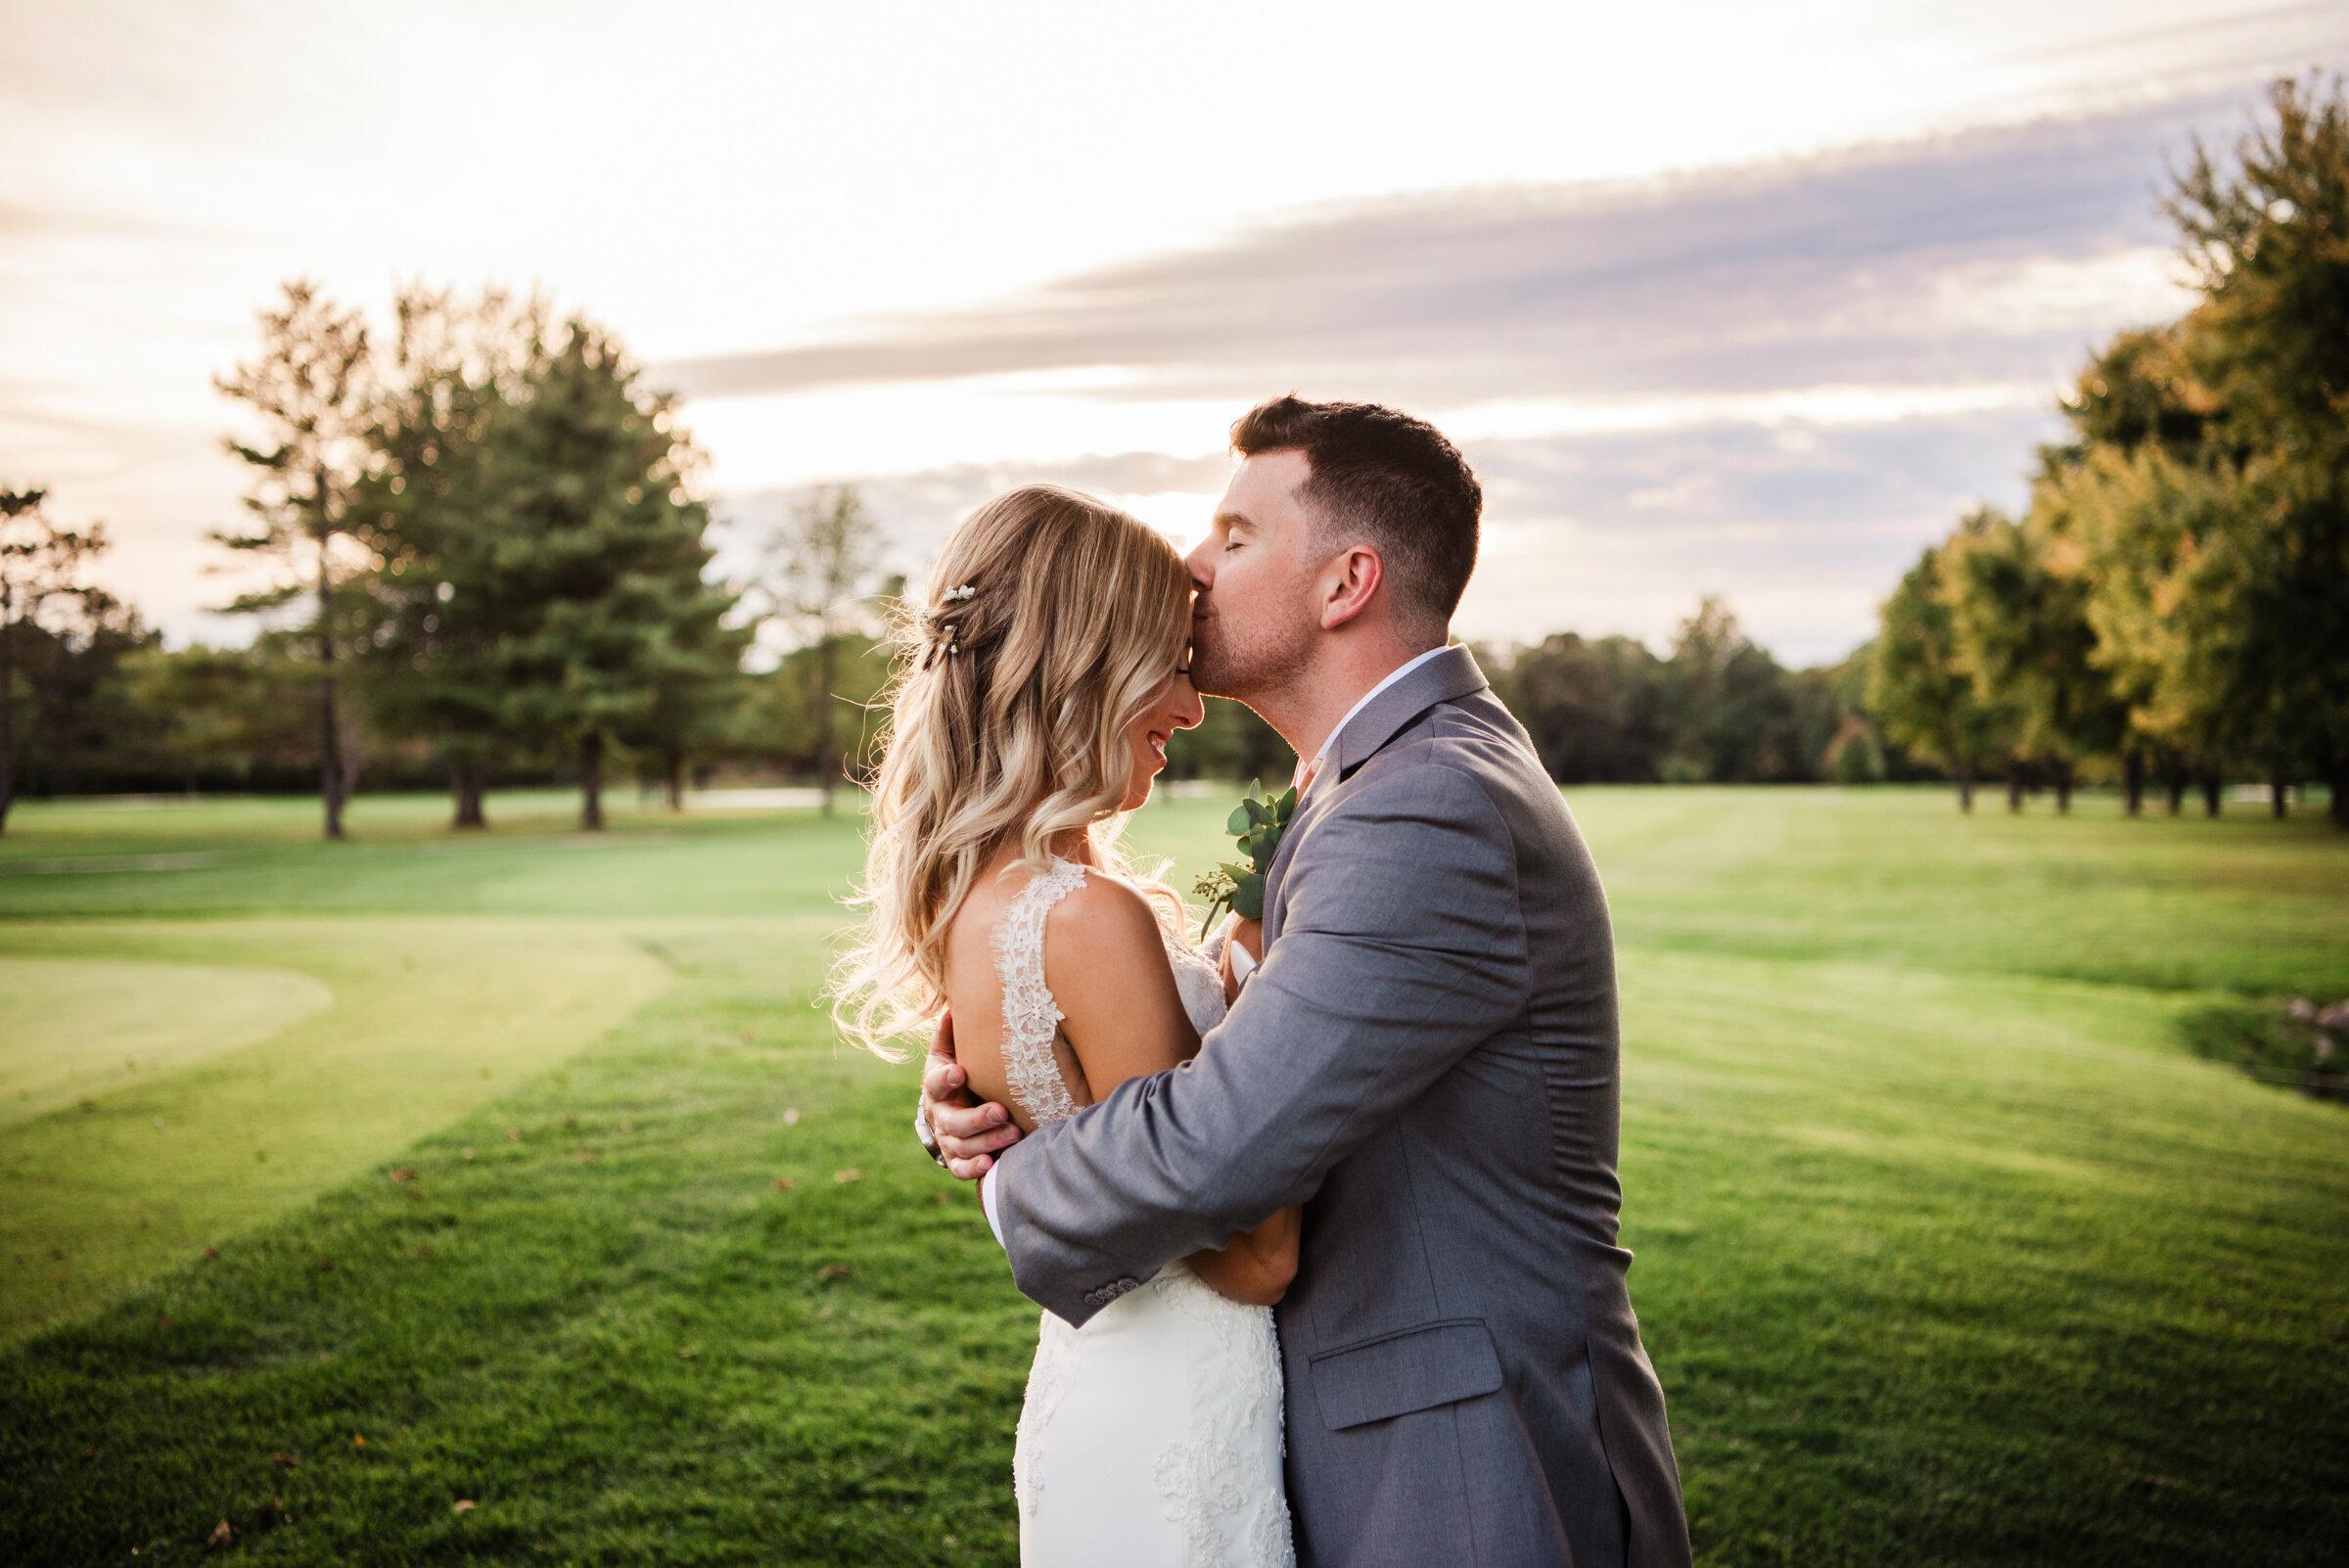 Deerfield_Country_Club_Rochester_Wedding_JILL_STUDIO_Rochester_NY_Photographer_DSC_6979.jpg